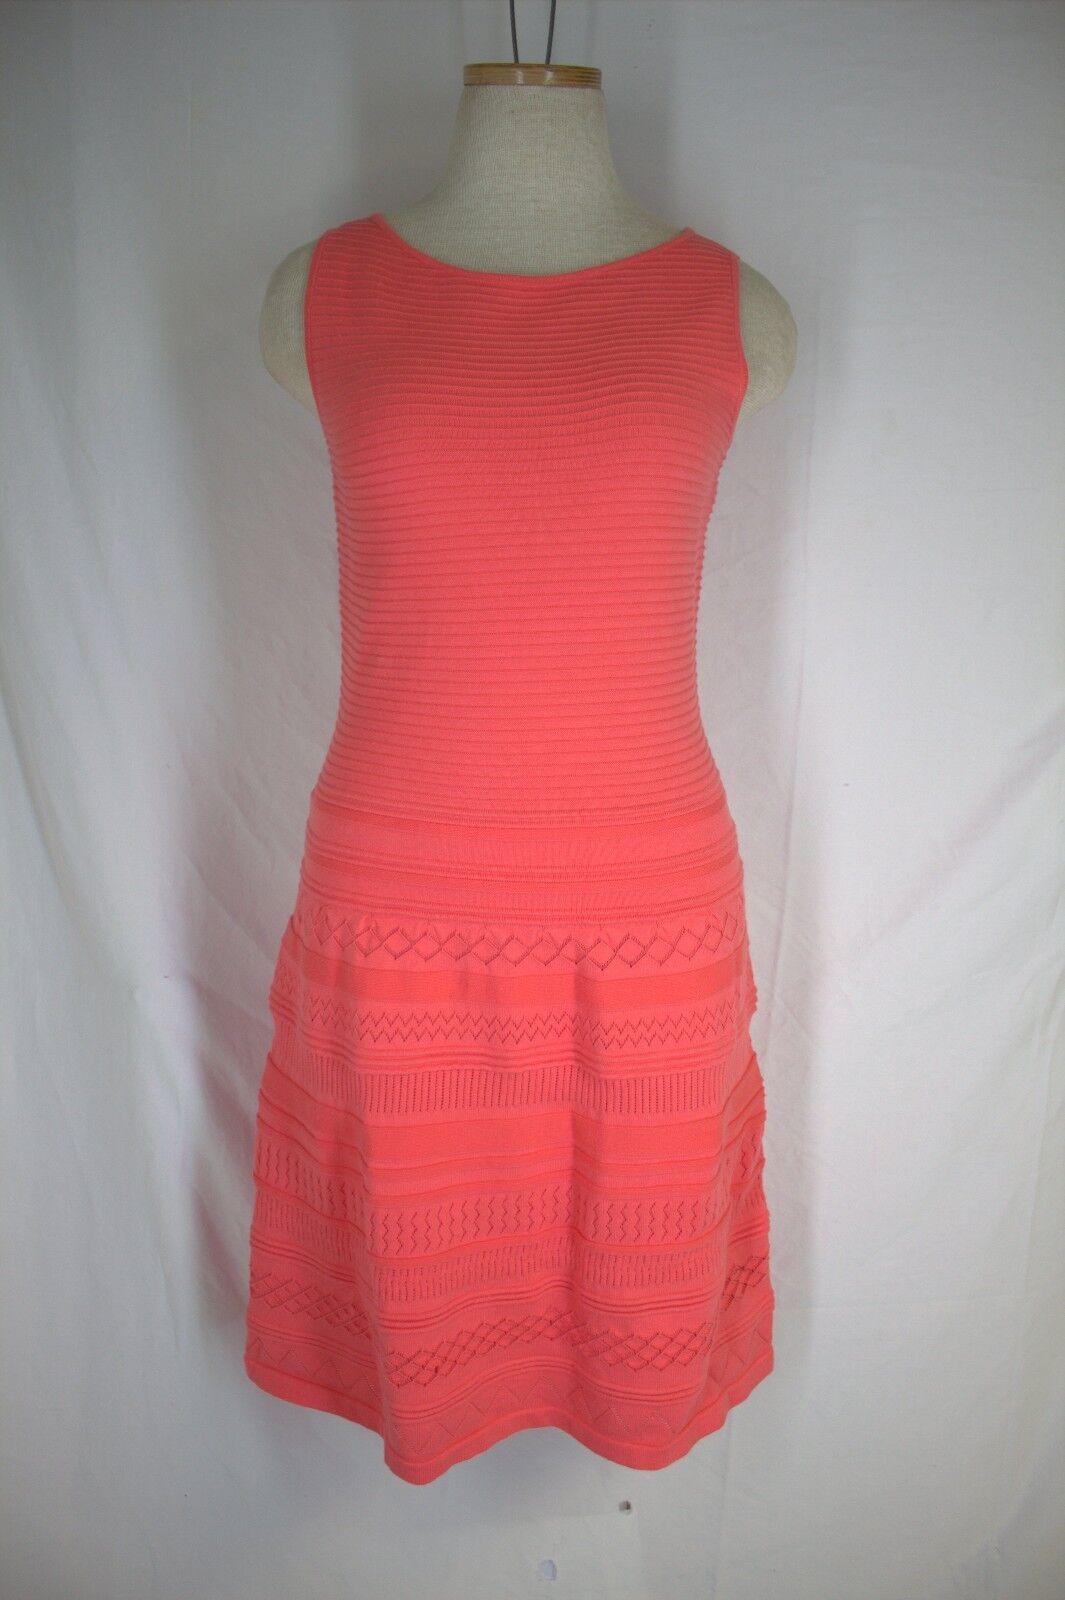 RALPH LAUREN DRESS  Knit Sweater Dress SMALL Peach Coral Sunrise Lined